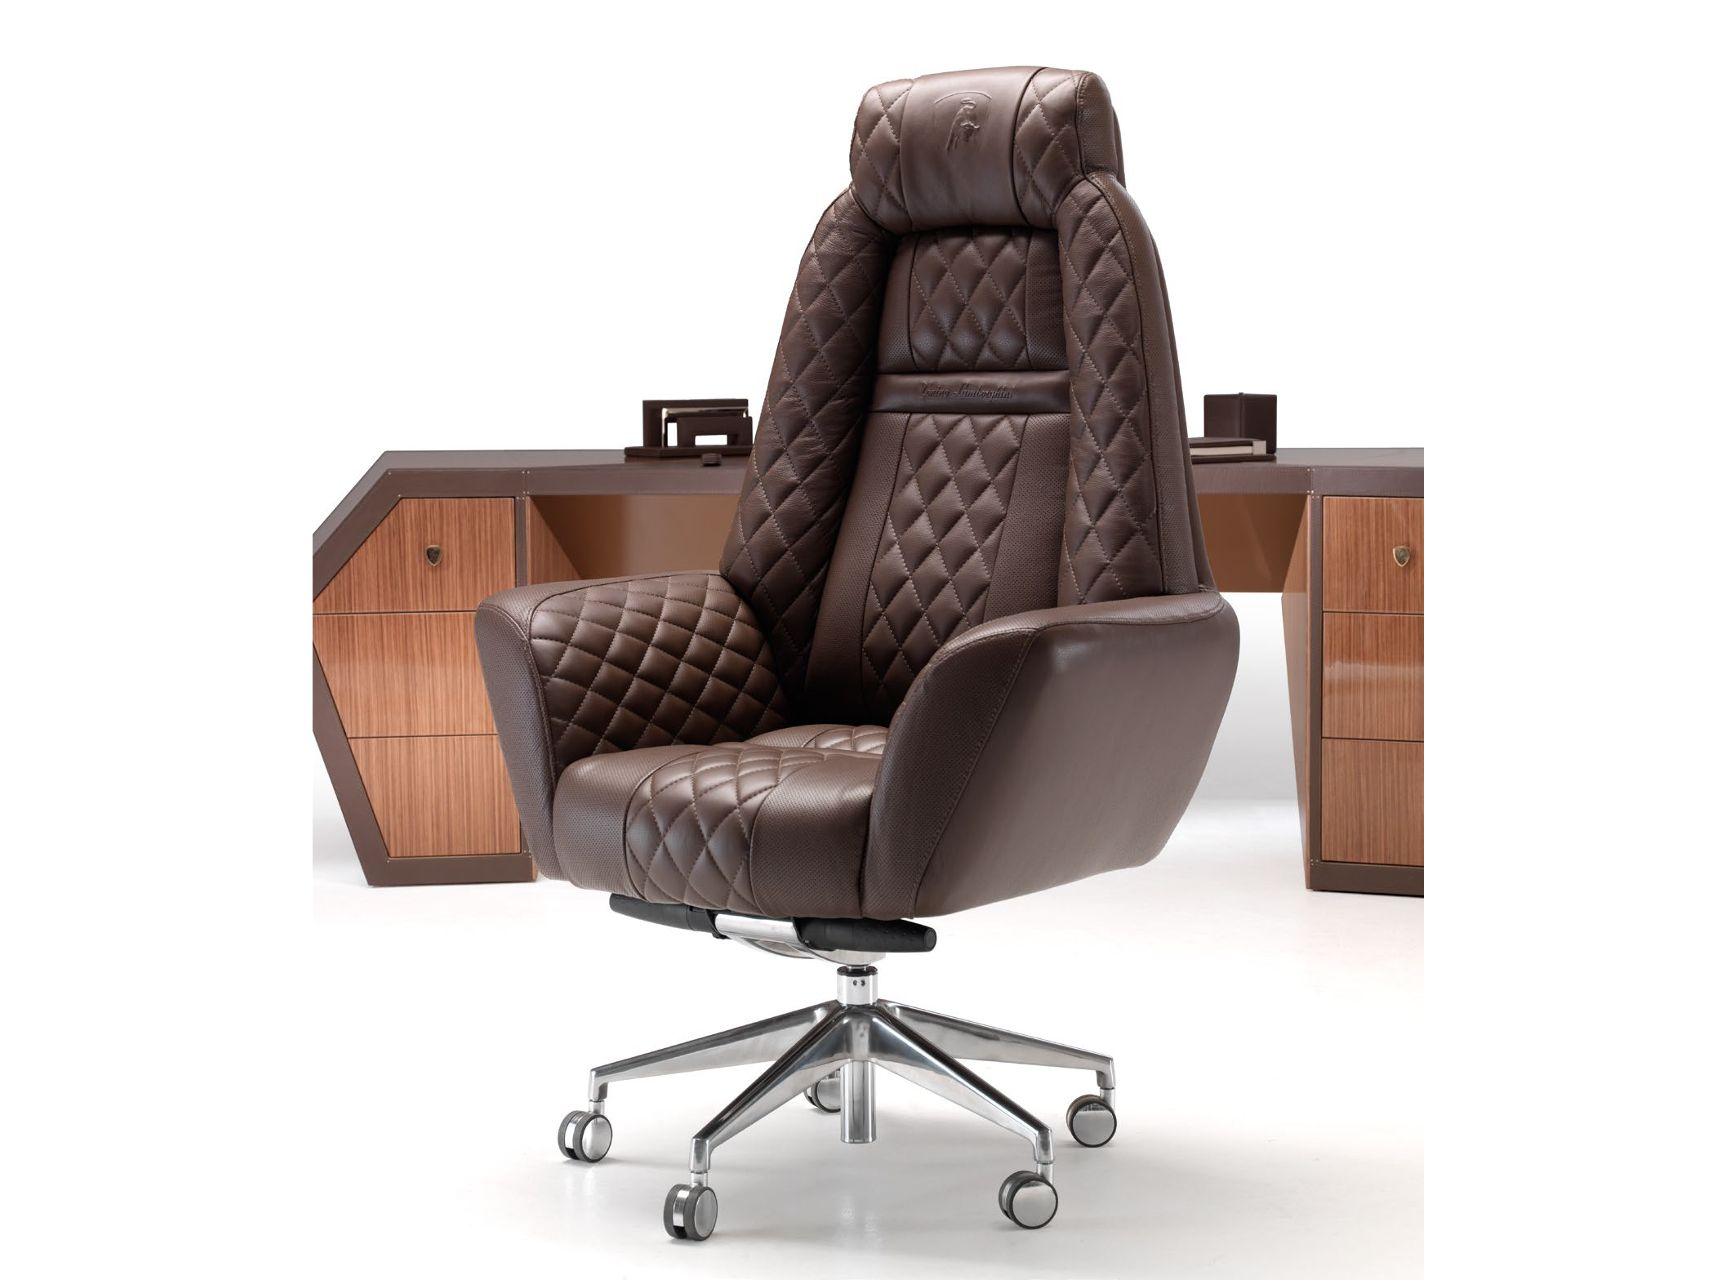 Long Beach High Back Executive Chair Long Beach Collection By Tonino Lamborghini Casa Office Chair Design Executive Chair Chair